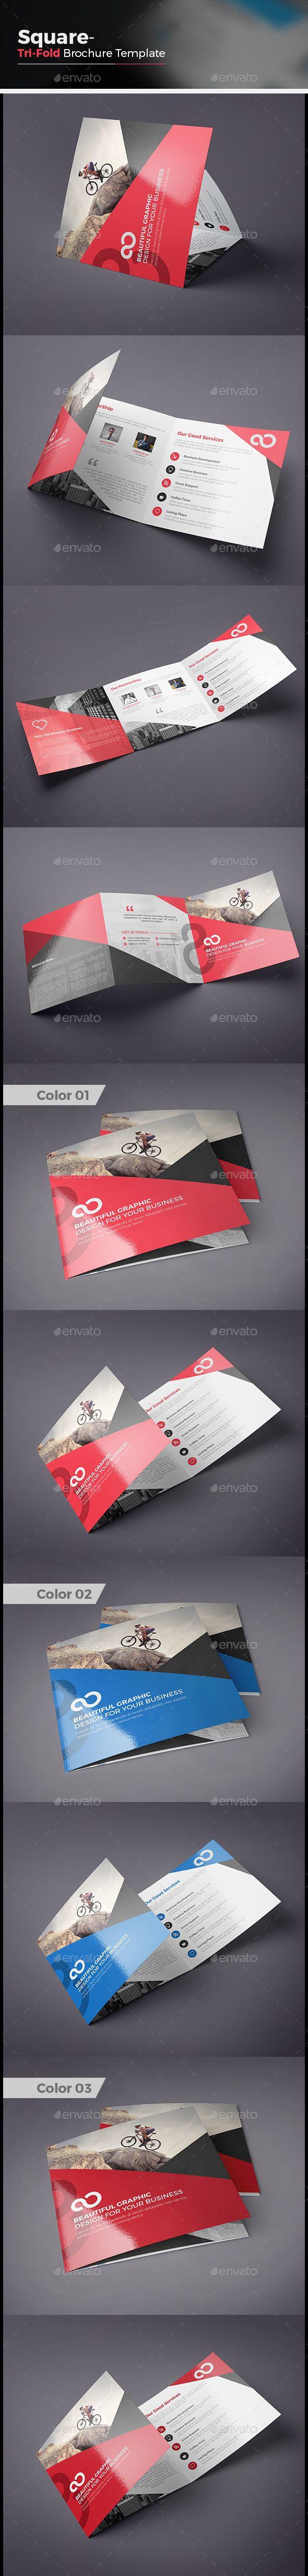 Square Tri fold Business Brochure Template Vector EPS, AI Illustrator #design Download: http://graphicriver.net/item/square-tri-fold-business-brochure/14071811?ref=ksioks